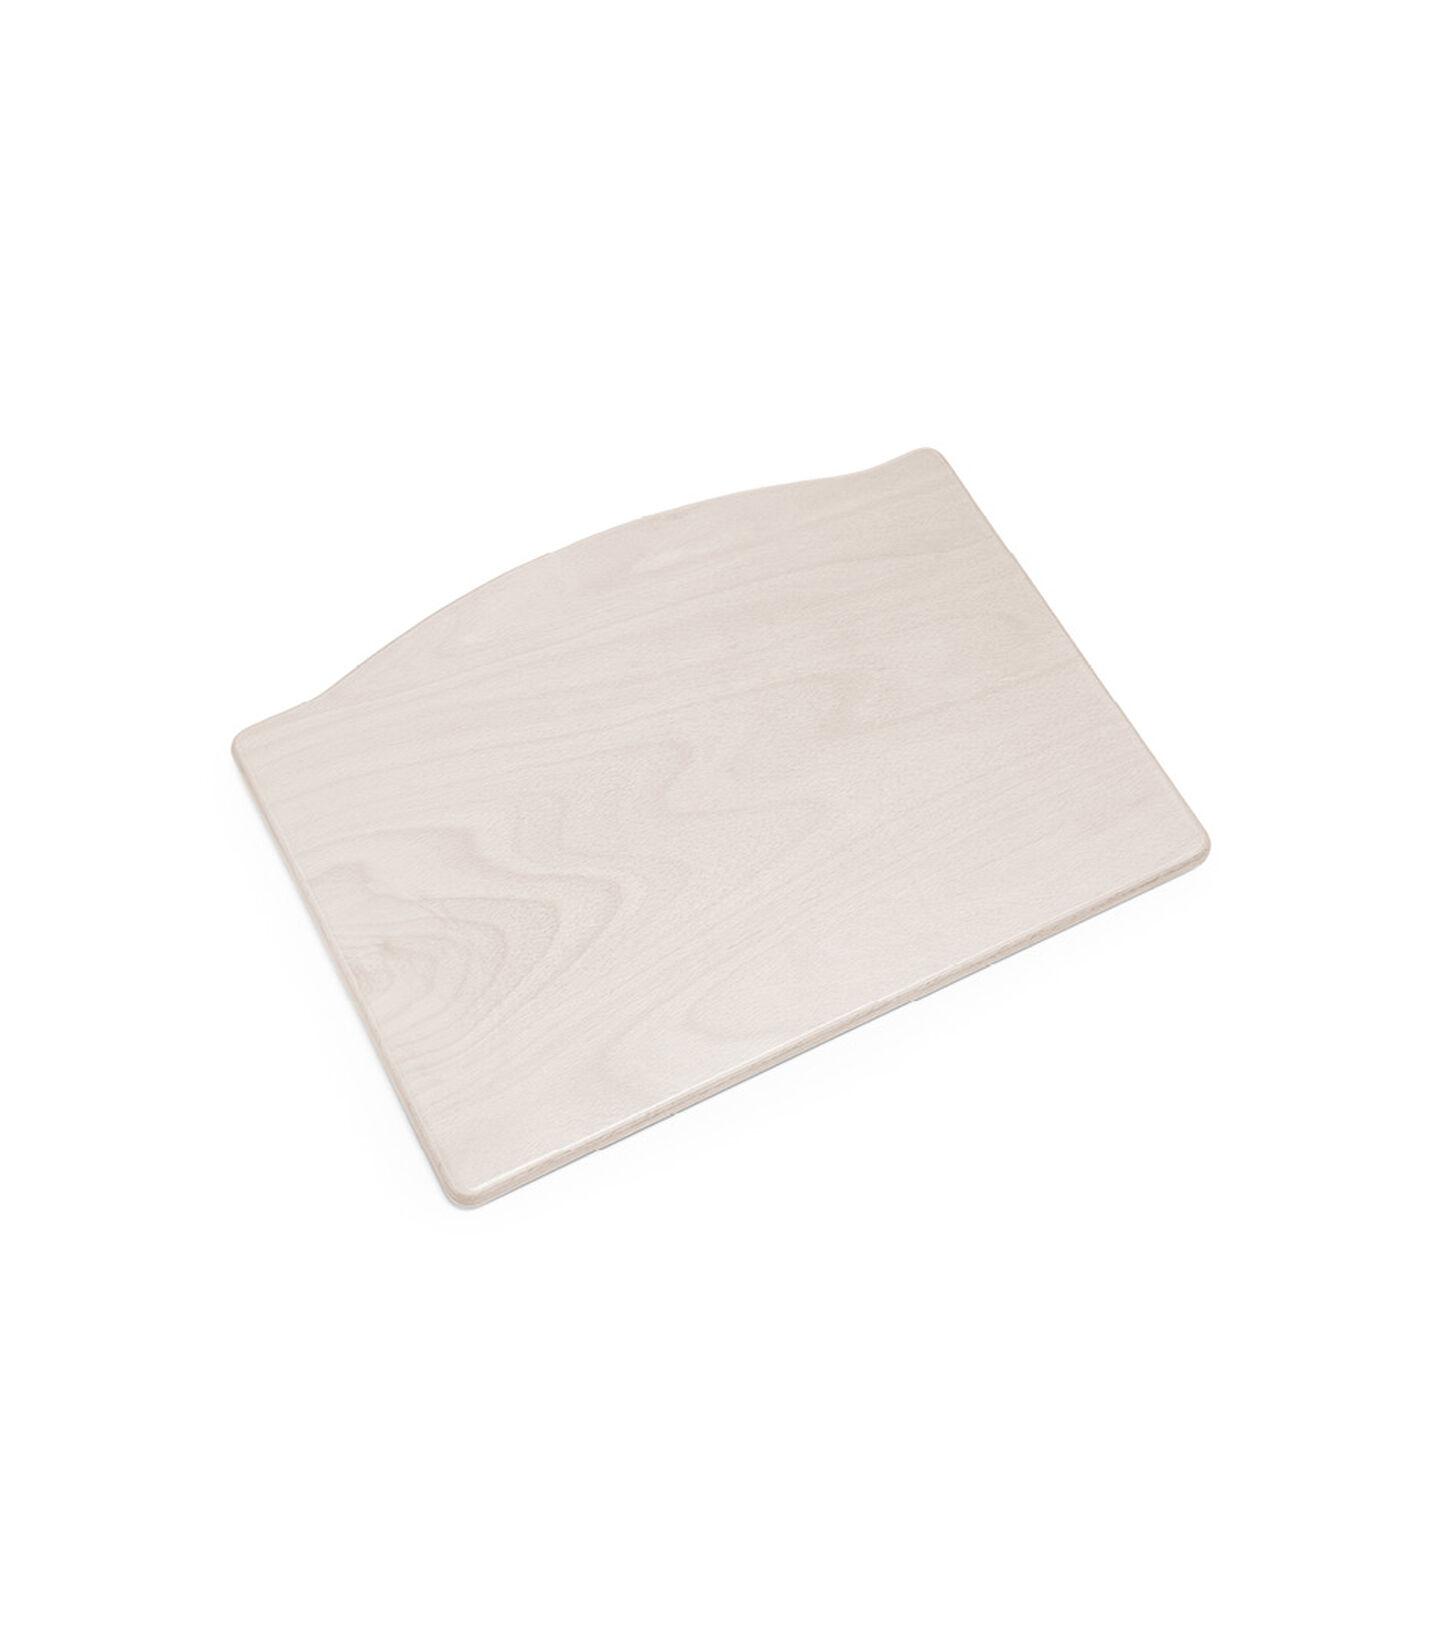 108905 Tripp Trapp Foot plate Whitewash (Spare part). view 1